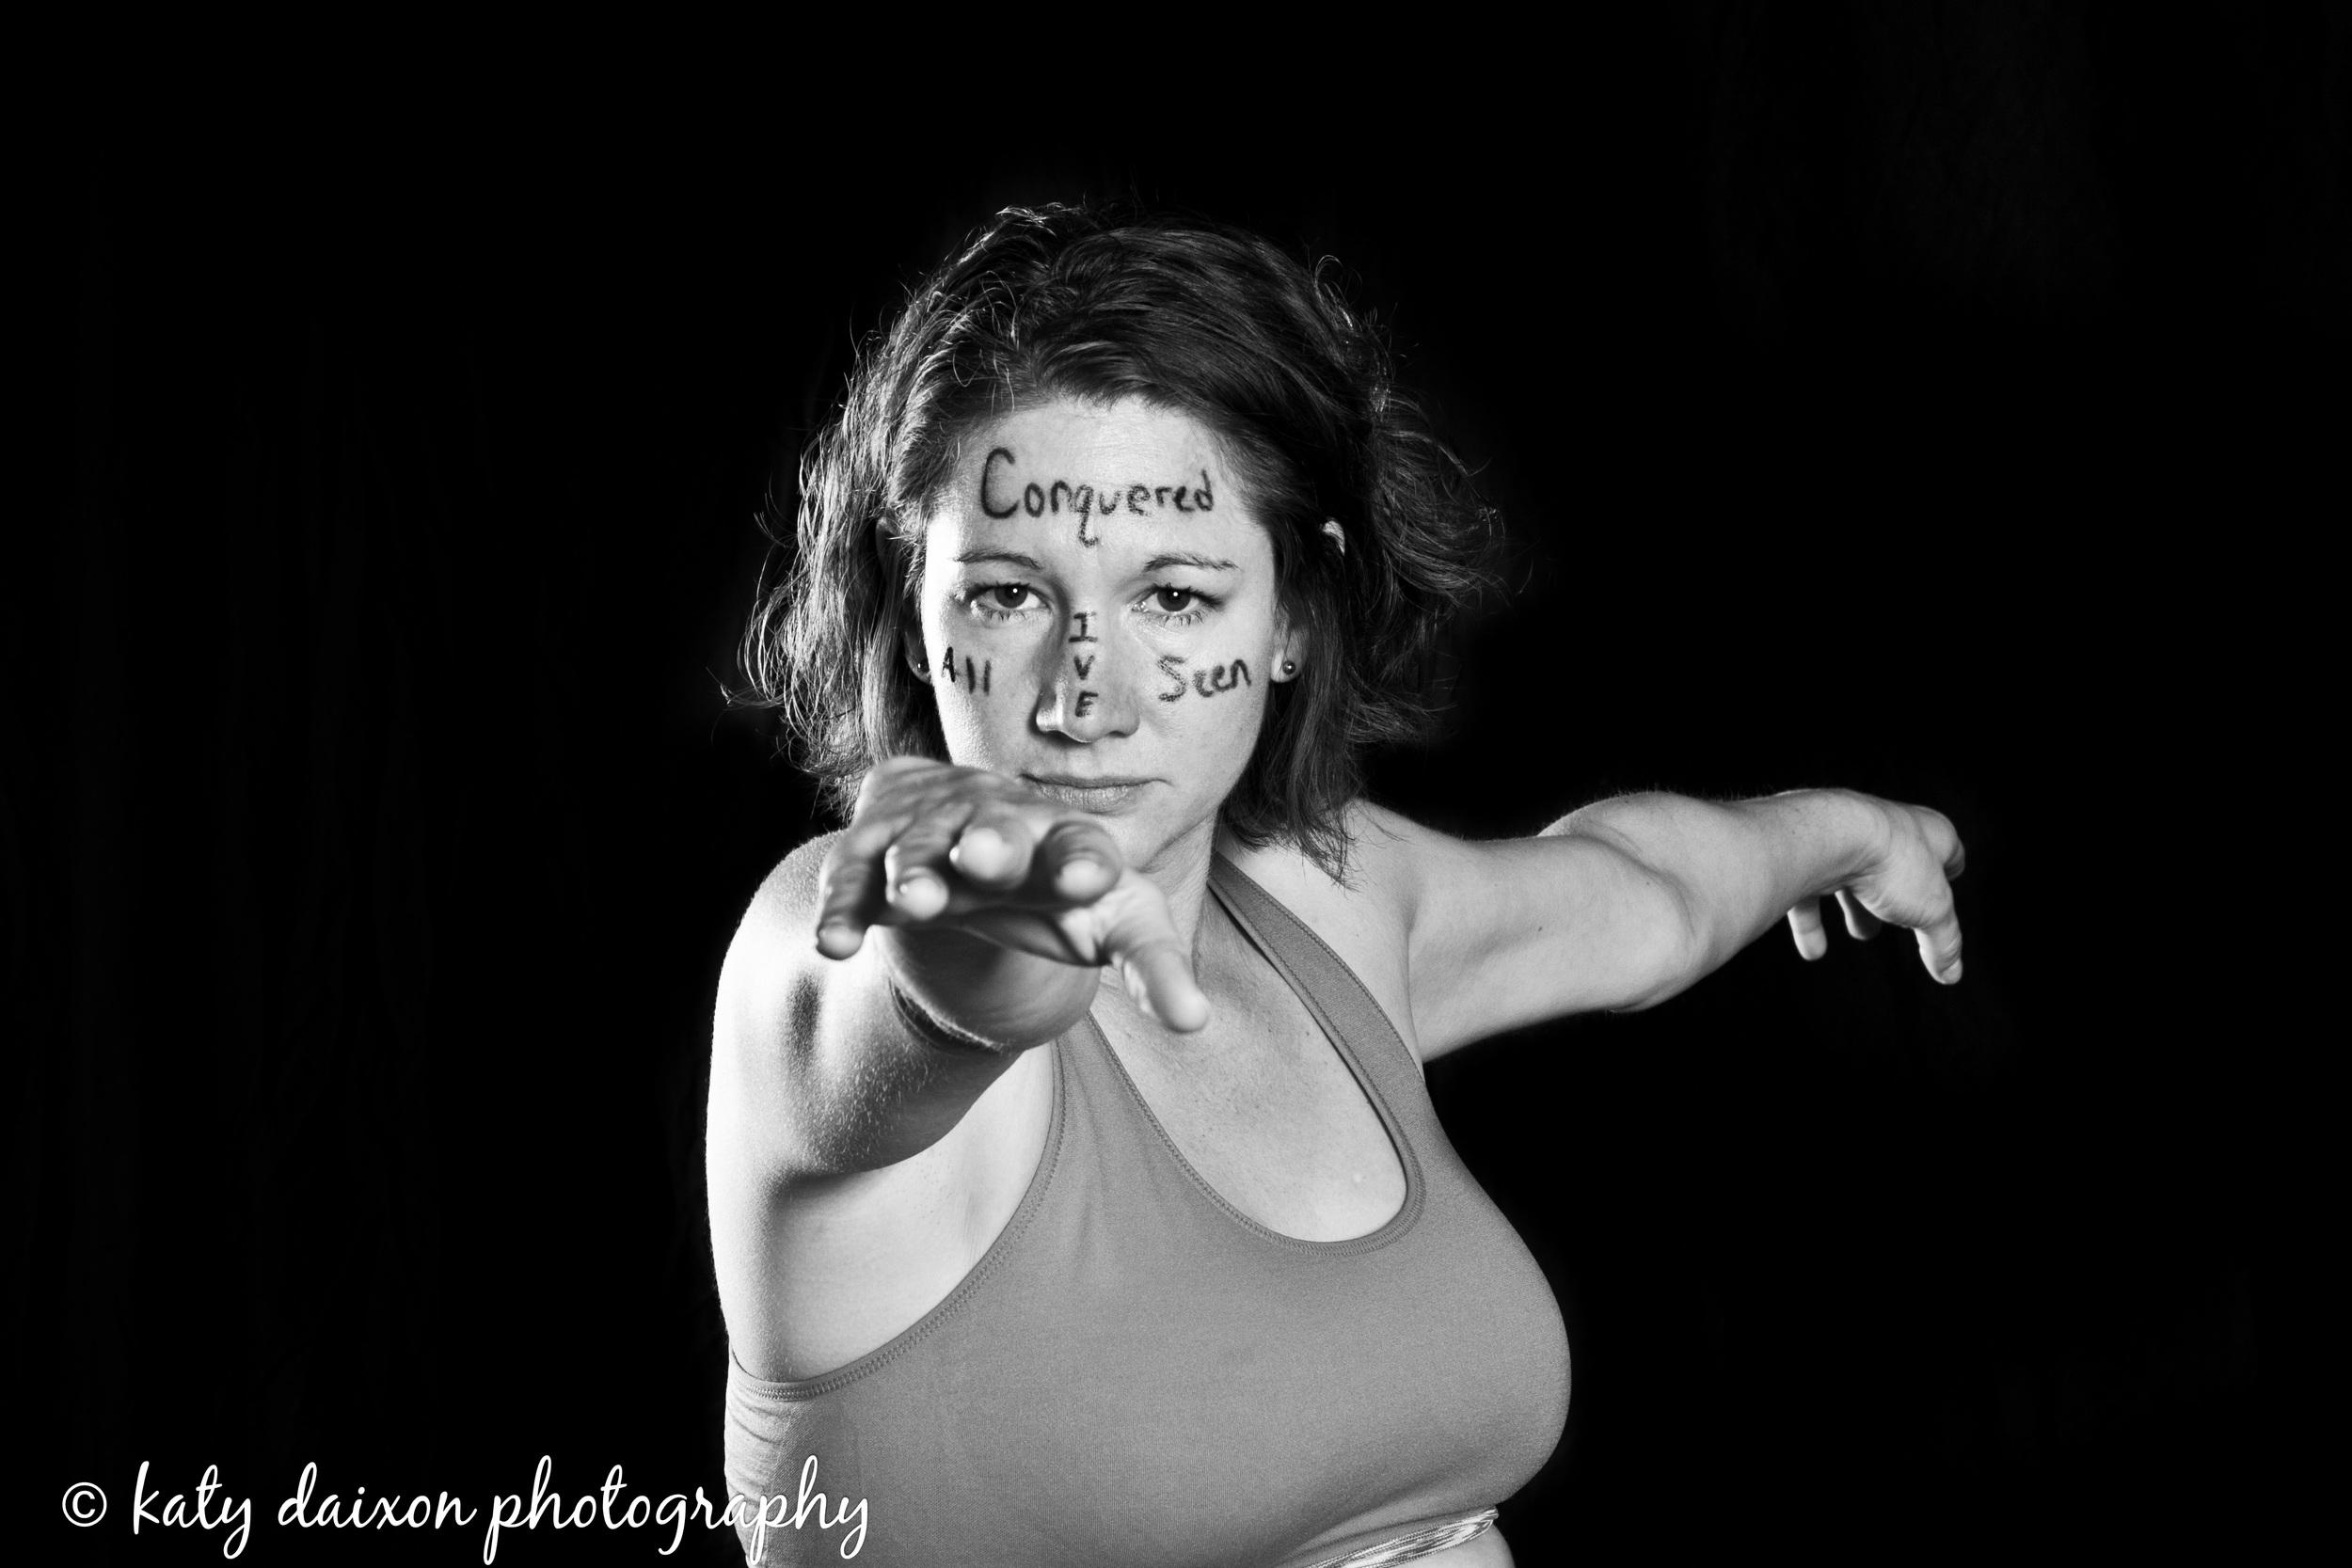 the-body-project-katy-daixon-photography-78.jpg